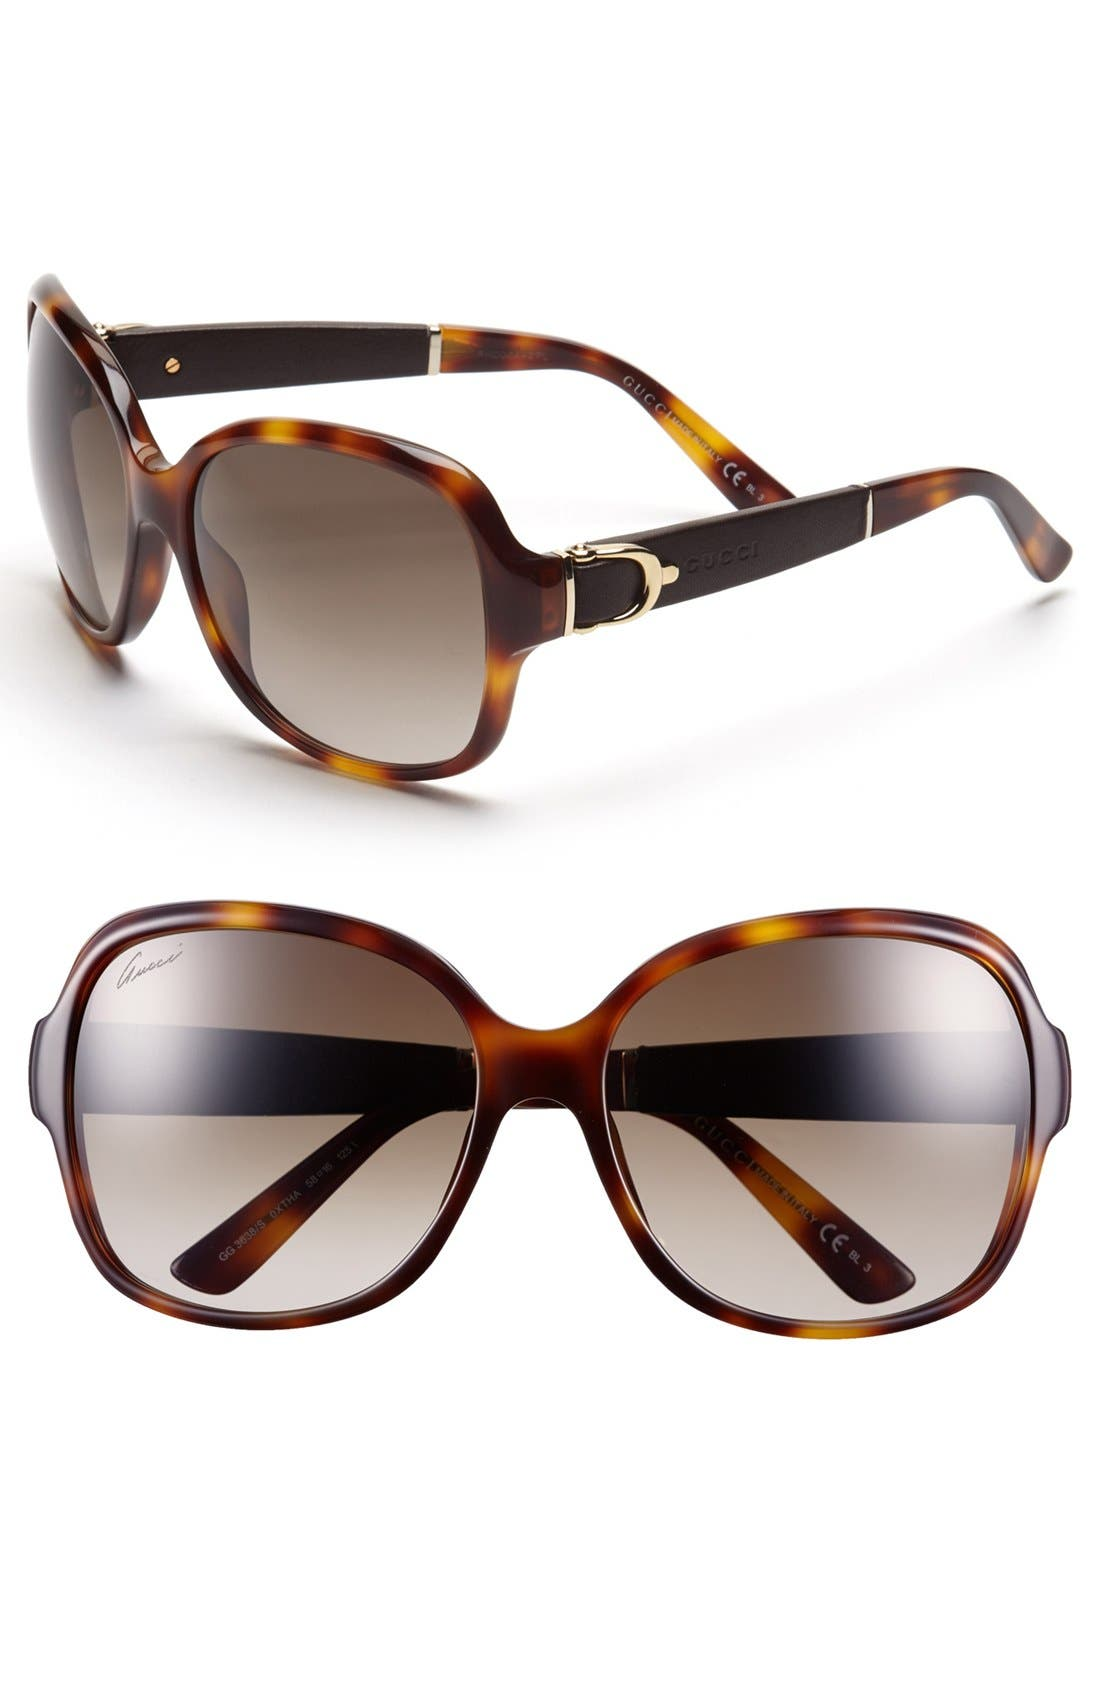 Main Image - Gucci 58mm Oversized Sunglasses